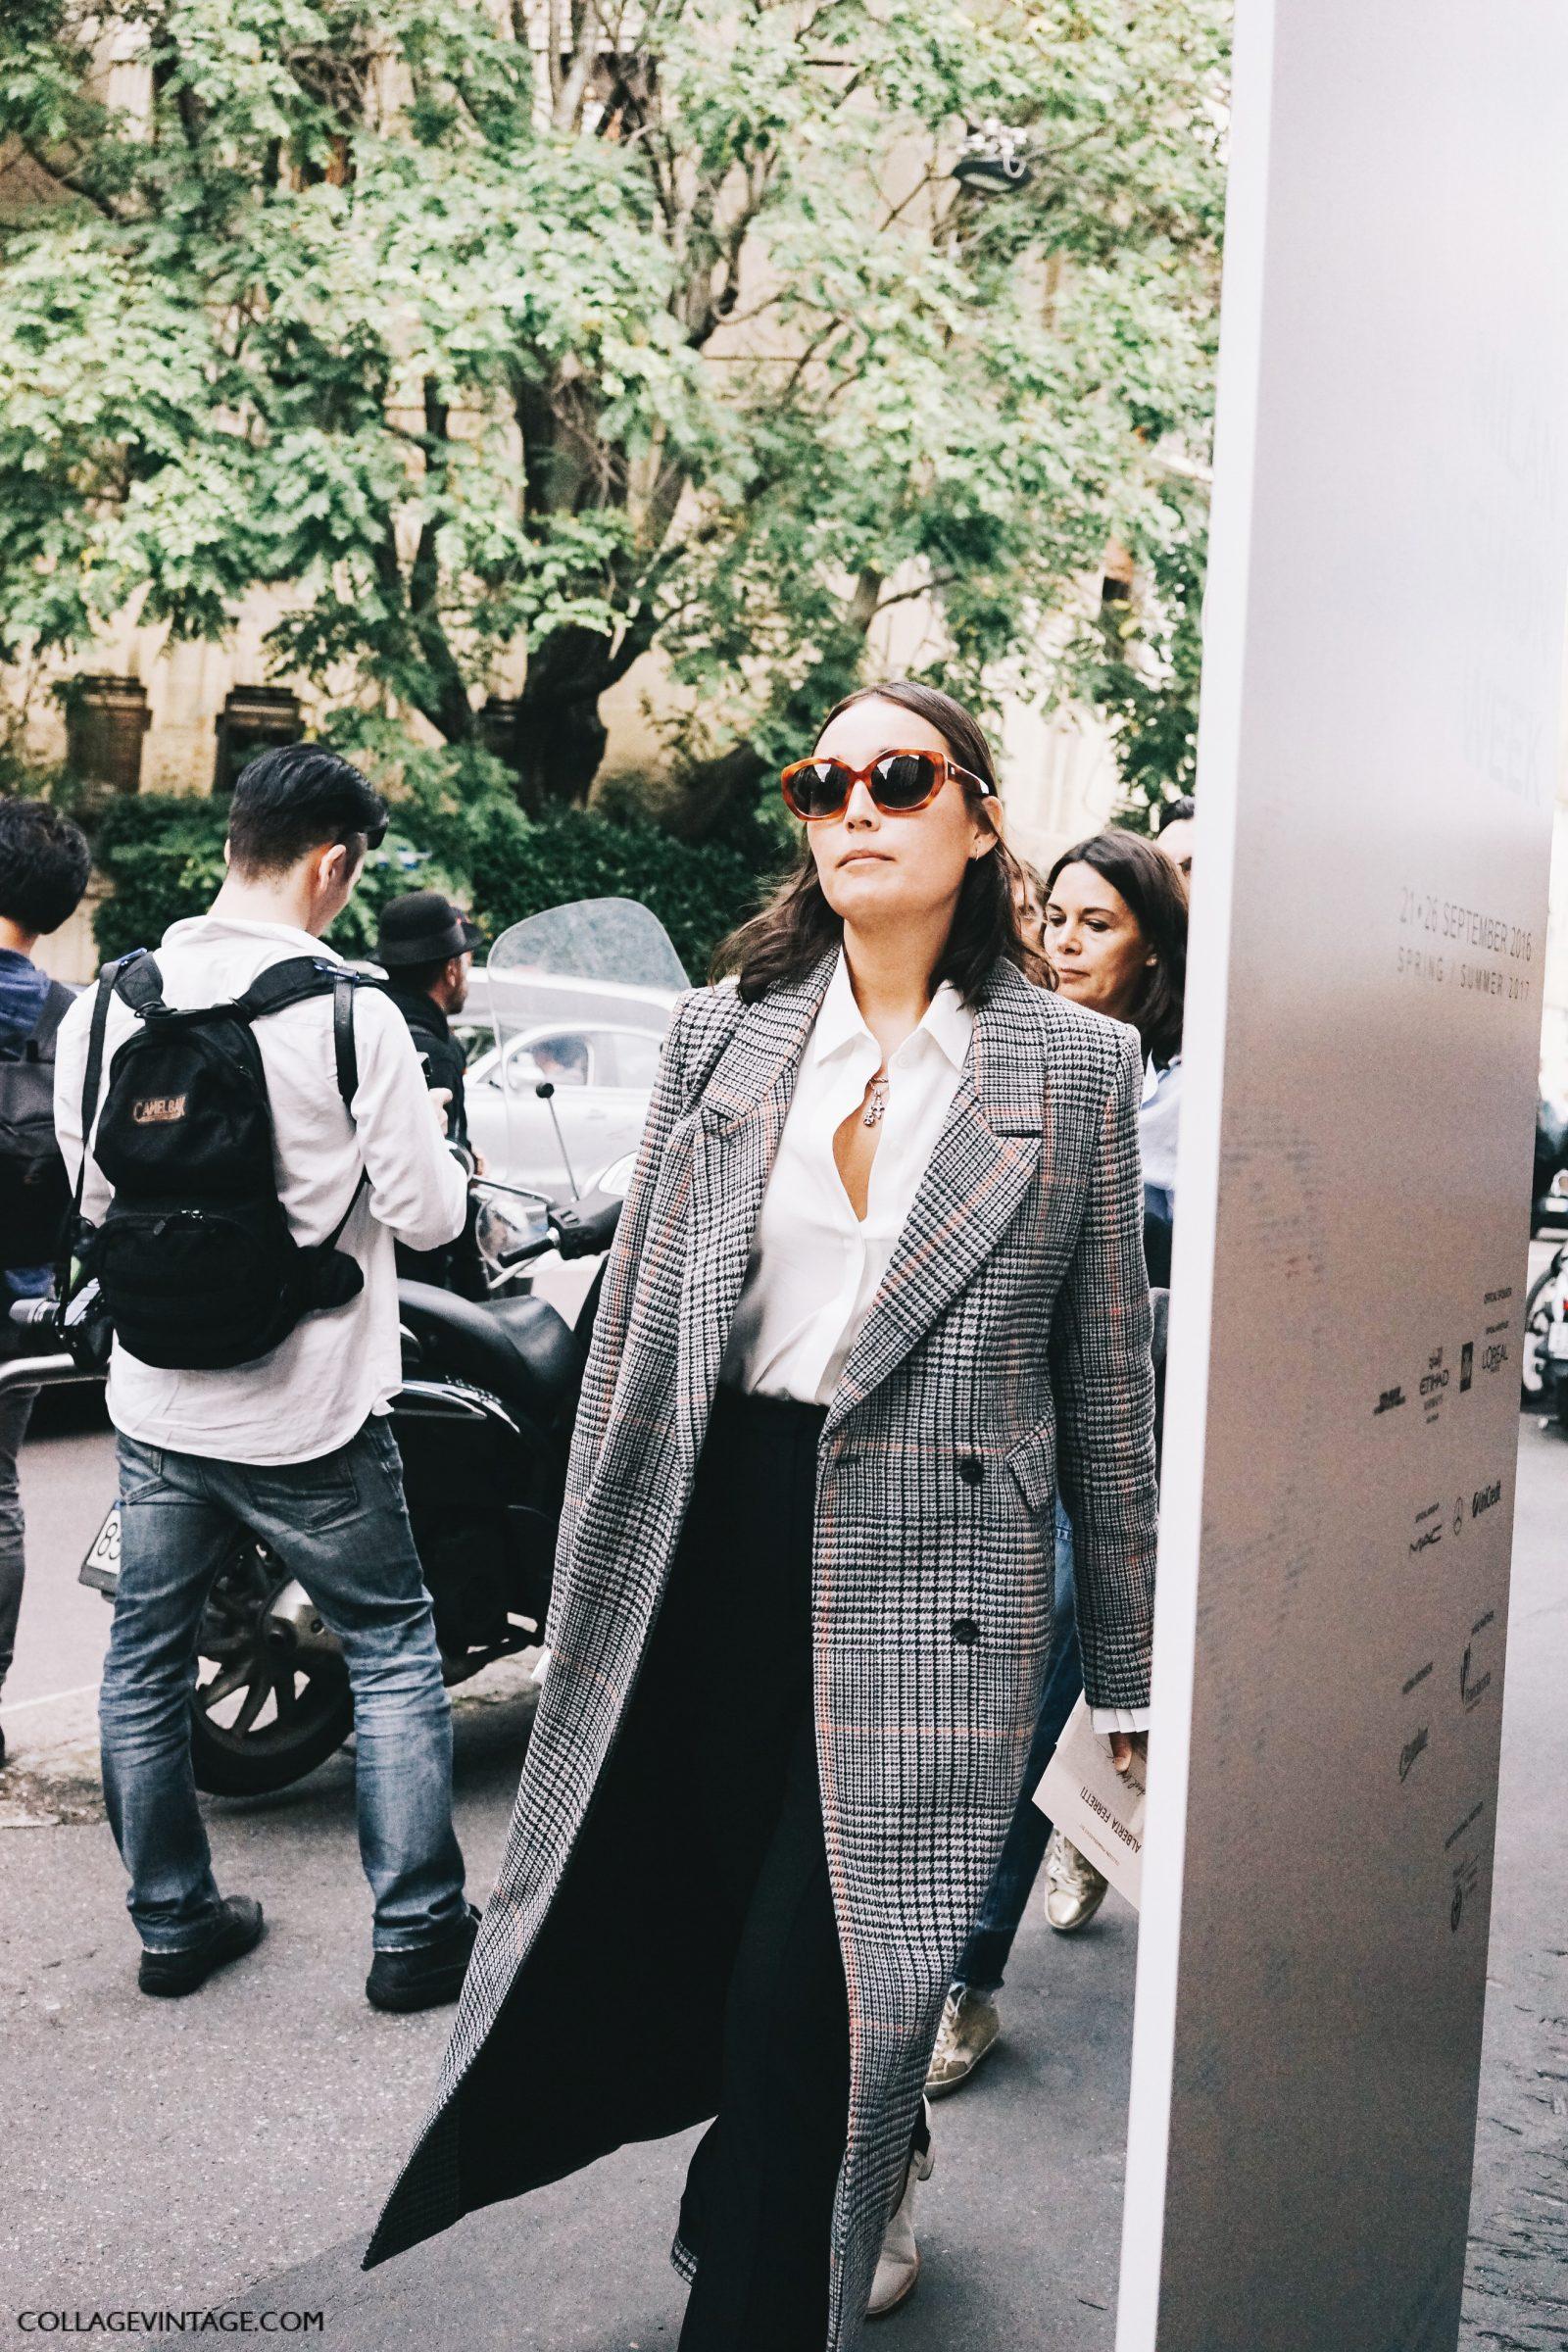 mfw-milan_fashion_week_ss17-street_style-outfits-collage_vintage-gucci-numero_21-alberta_ferreti-138